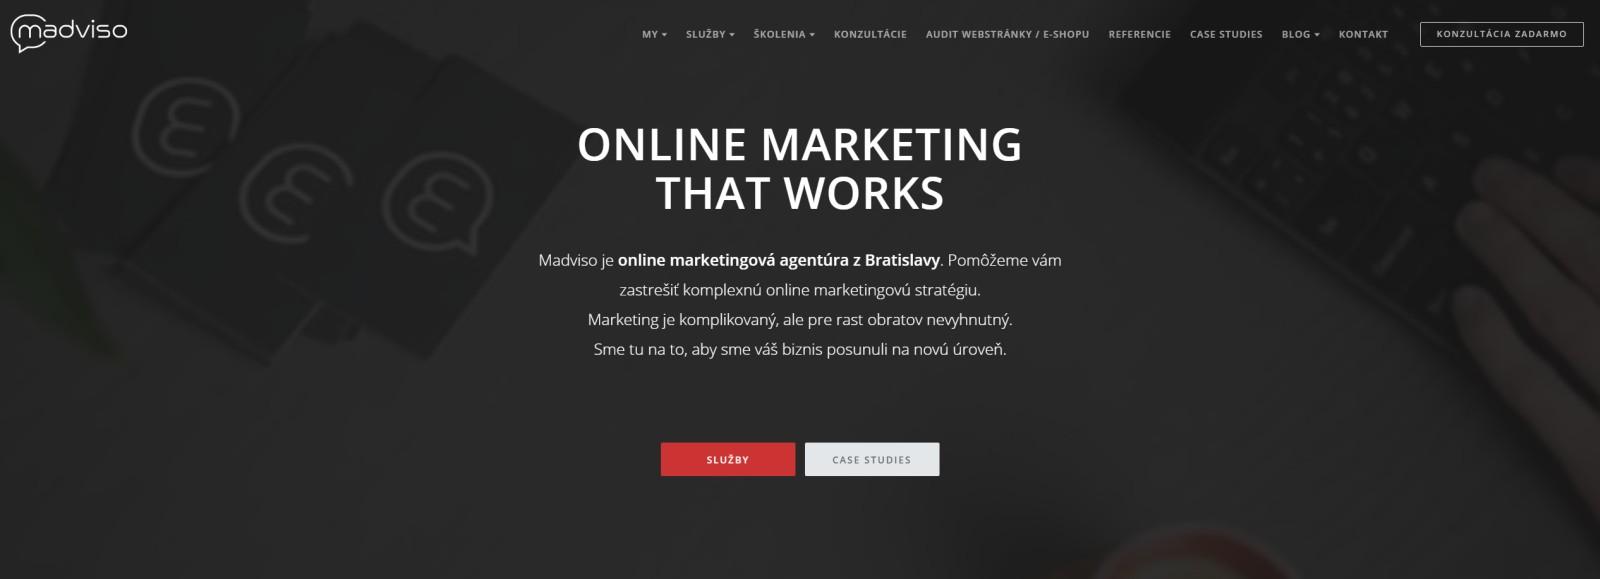 Madviso webstránka